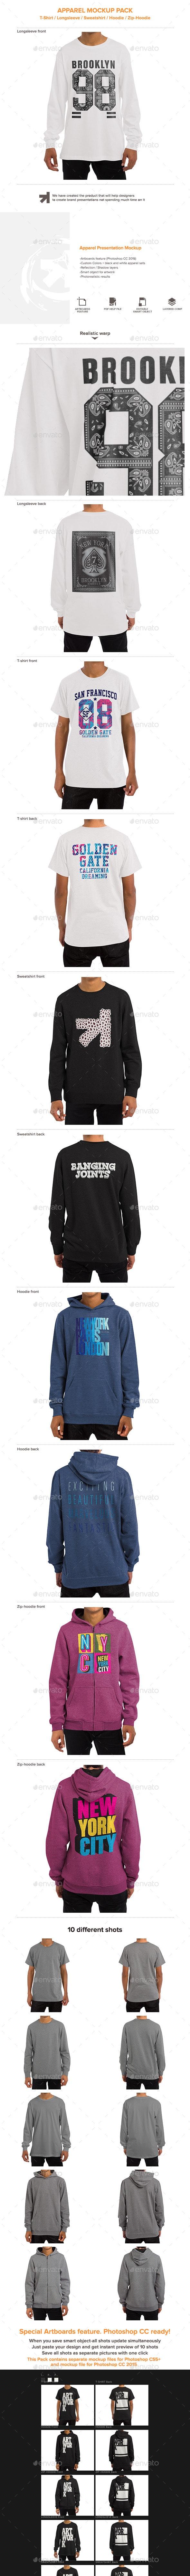 T-Shirt Longsleeve Sweatshirt Hoodie Mockup - Miscellaneous Apparel